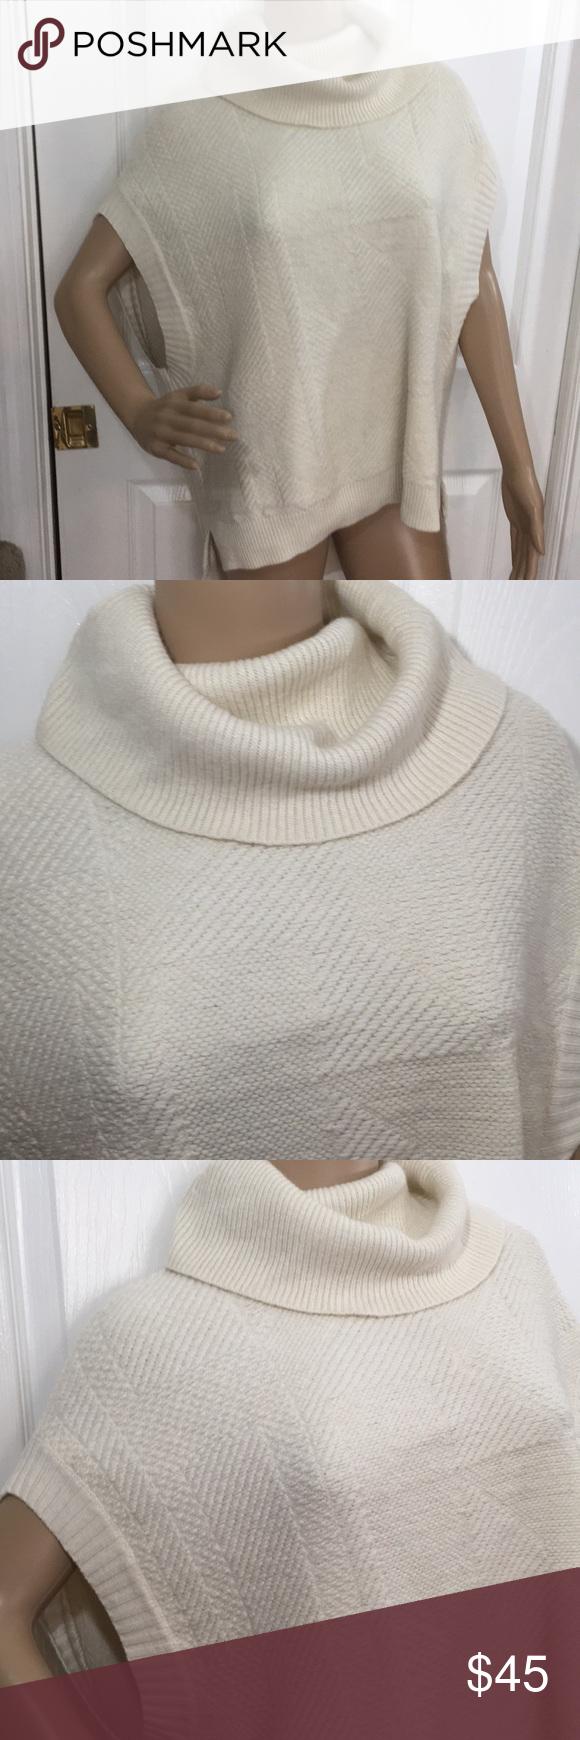 c97f7428444 BCBG Max Azria Oversized Sweater Beautiful off-white sleeveless sweater by BCBG  Max Azria